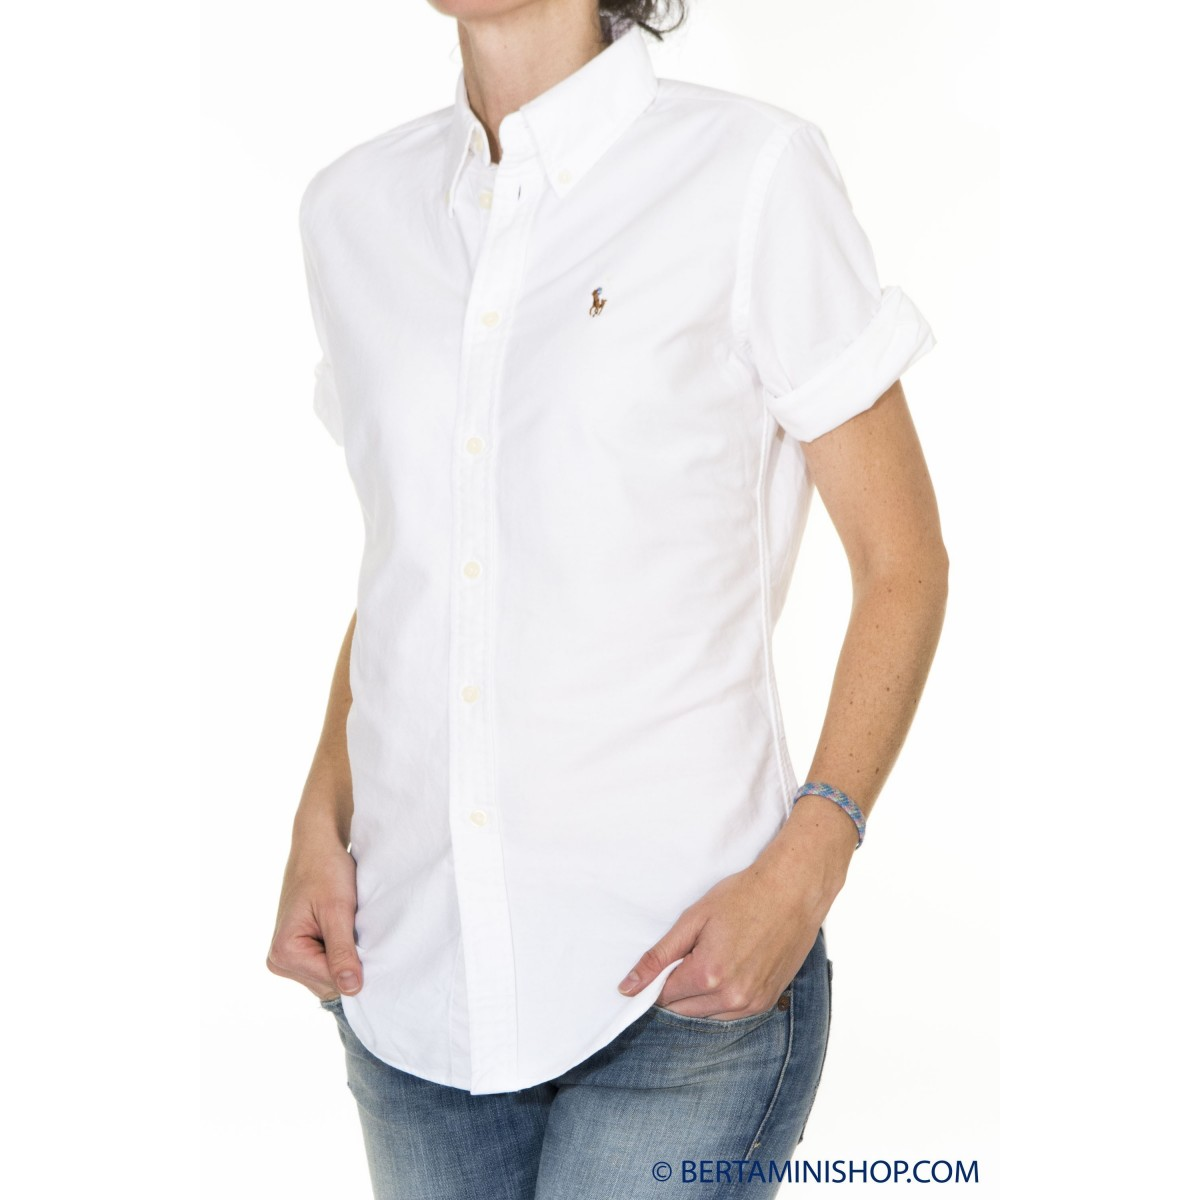 Camicia Ralph Lauren Donna - V33Ih843Bh843 B11D1 - Bianco